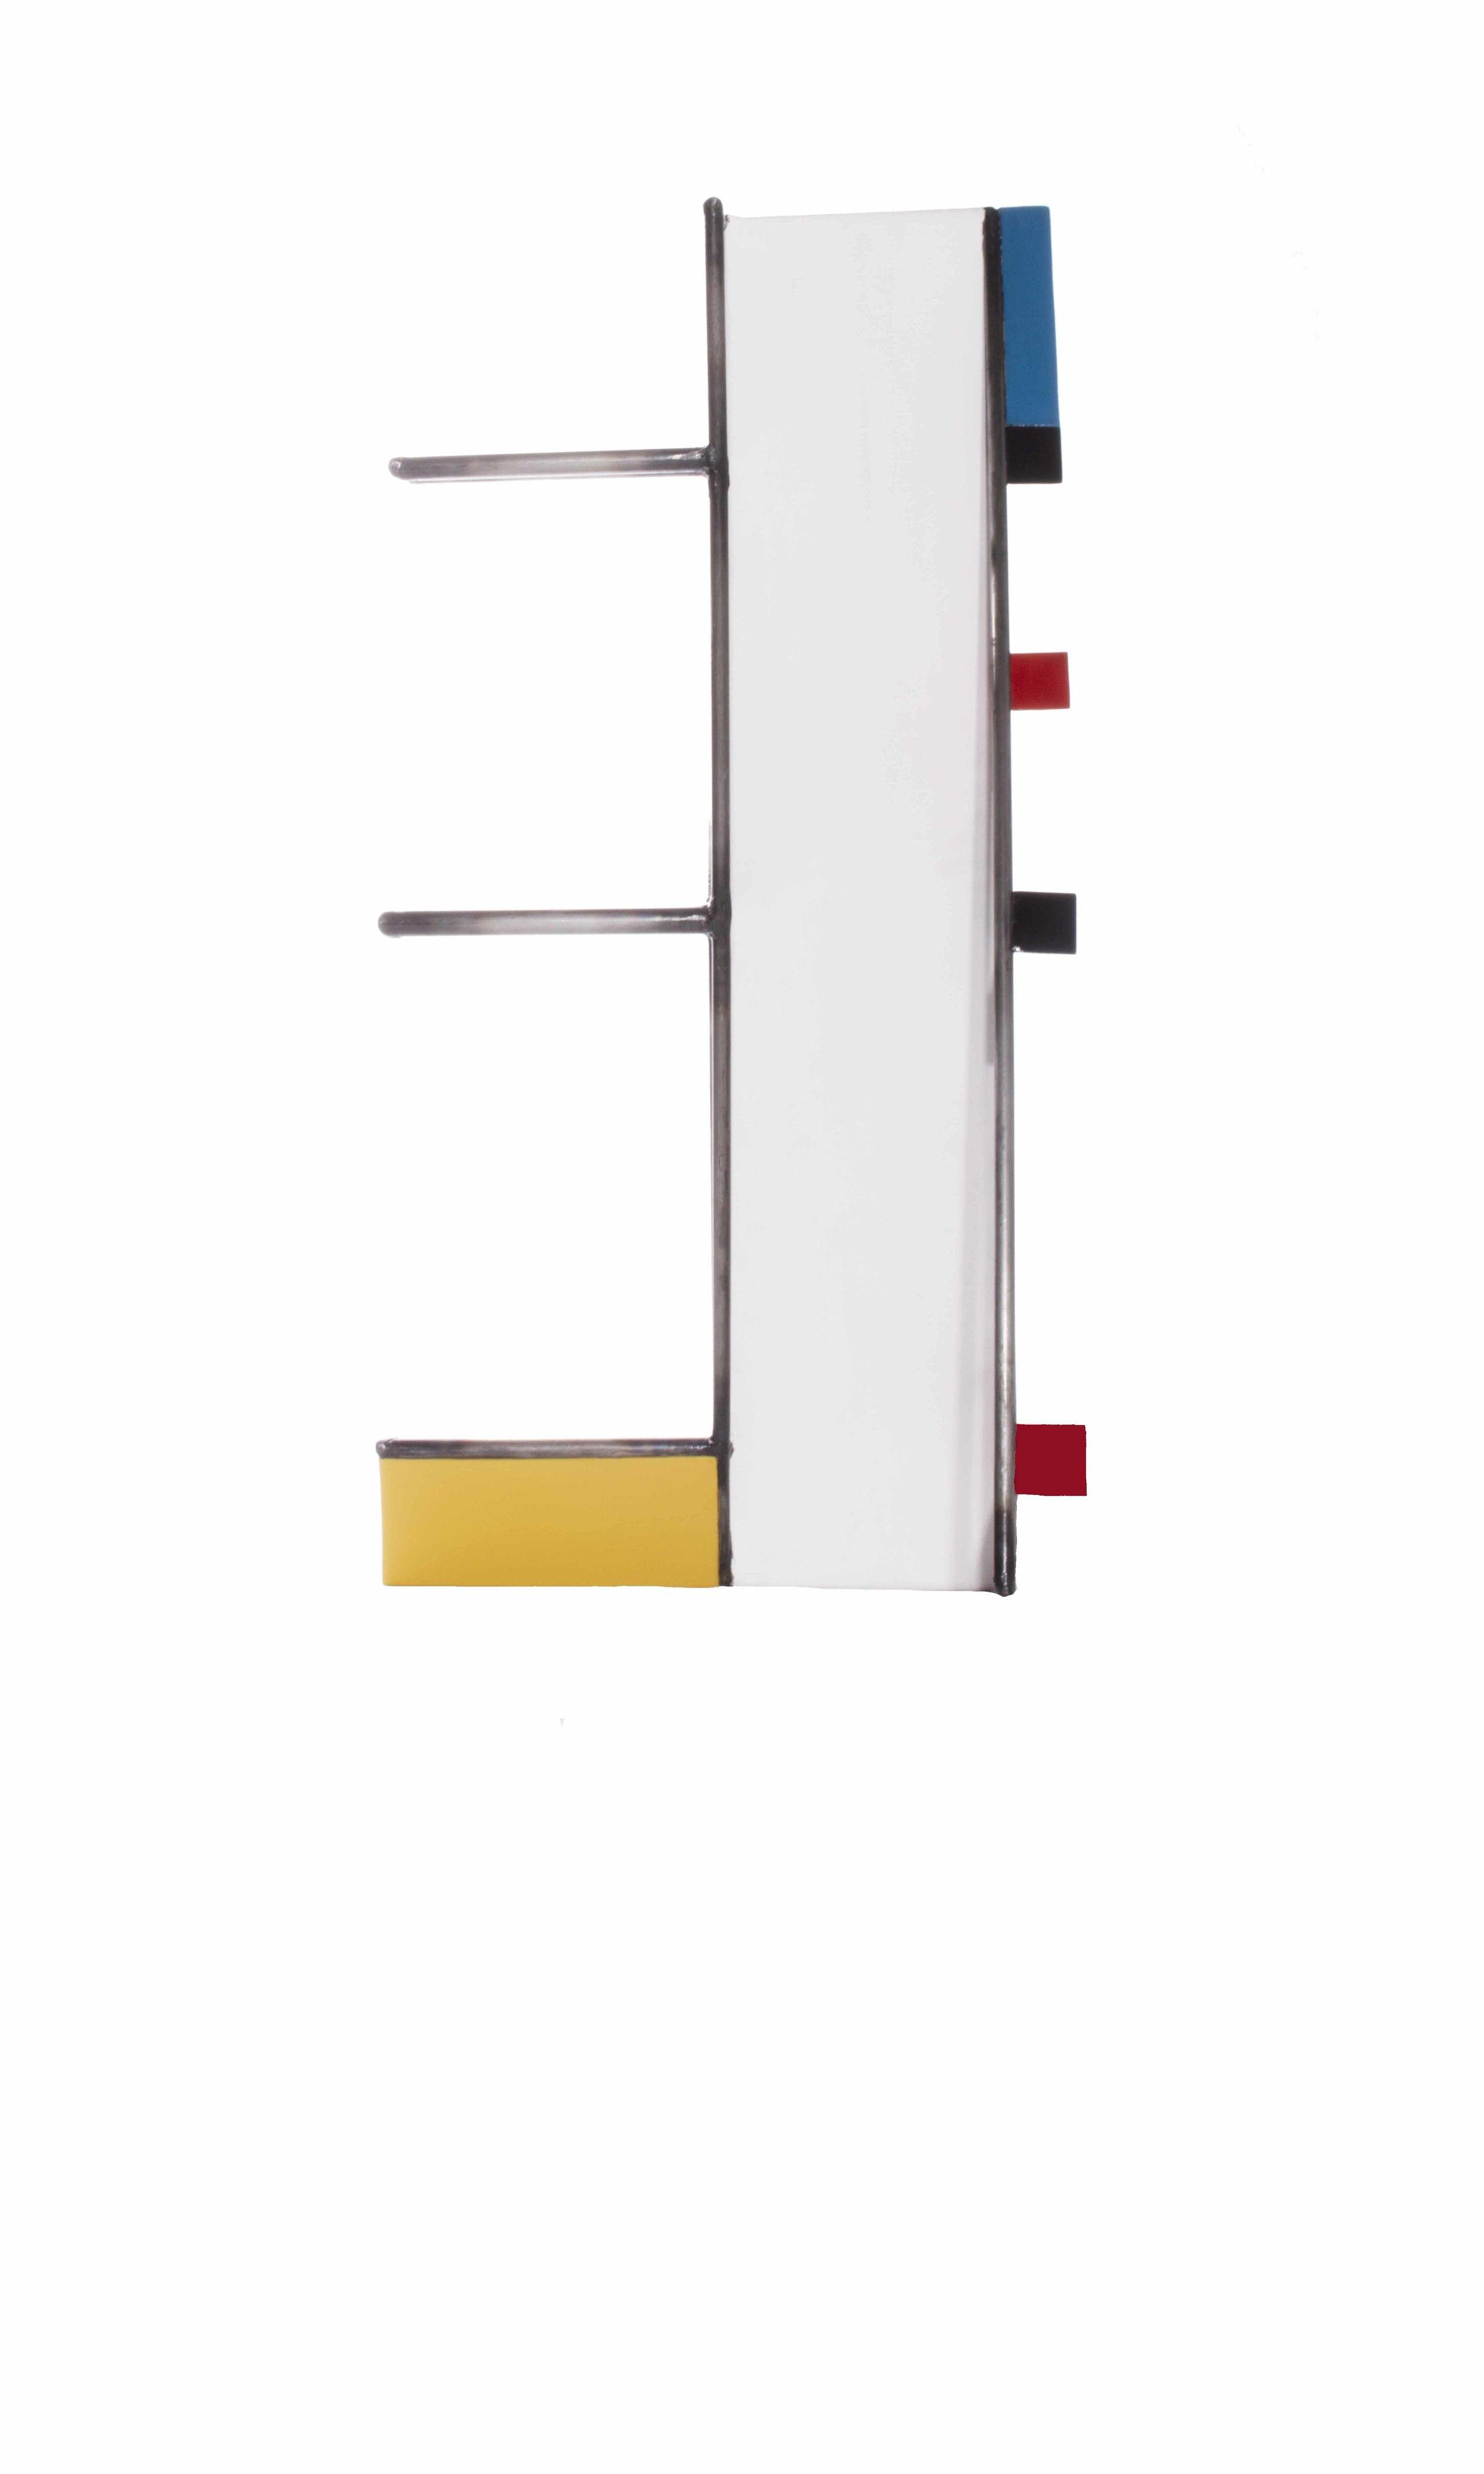 Mondrian Construction #6 (front view)